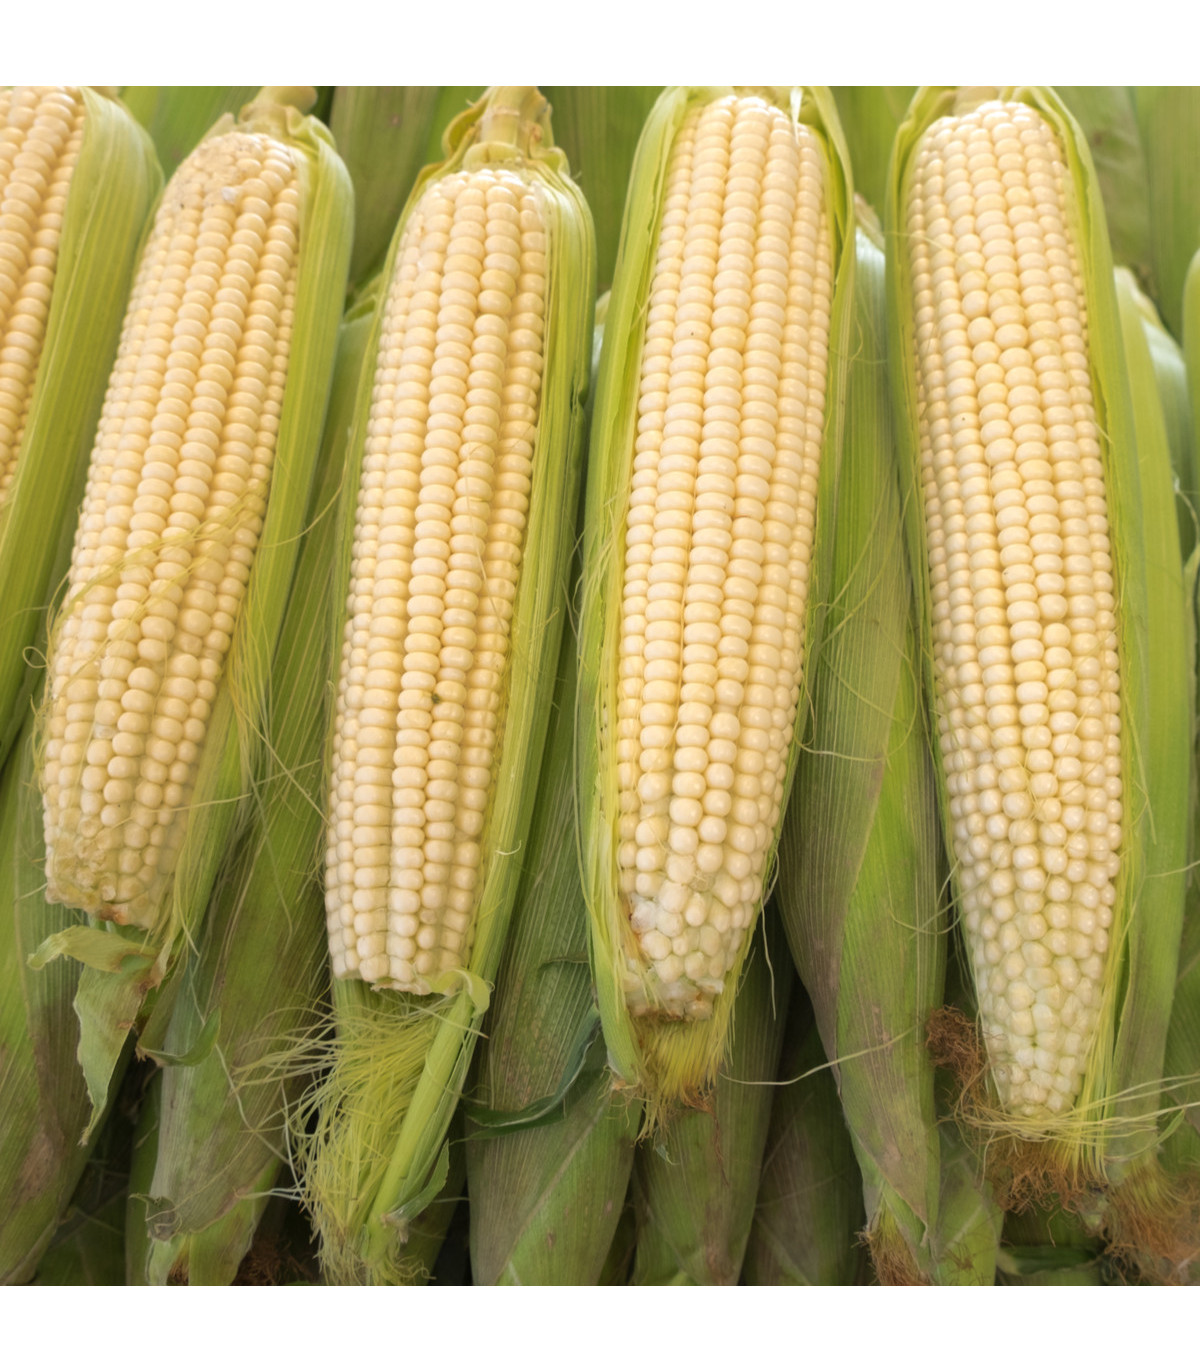 Kukuřice cukrová Tasty Sweet F1 - Zea Mays - semena Kukuřice - 16 ks